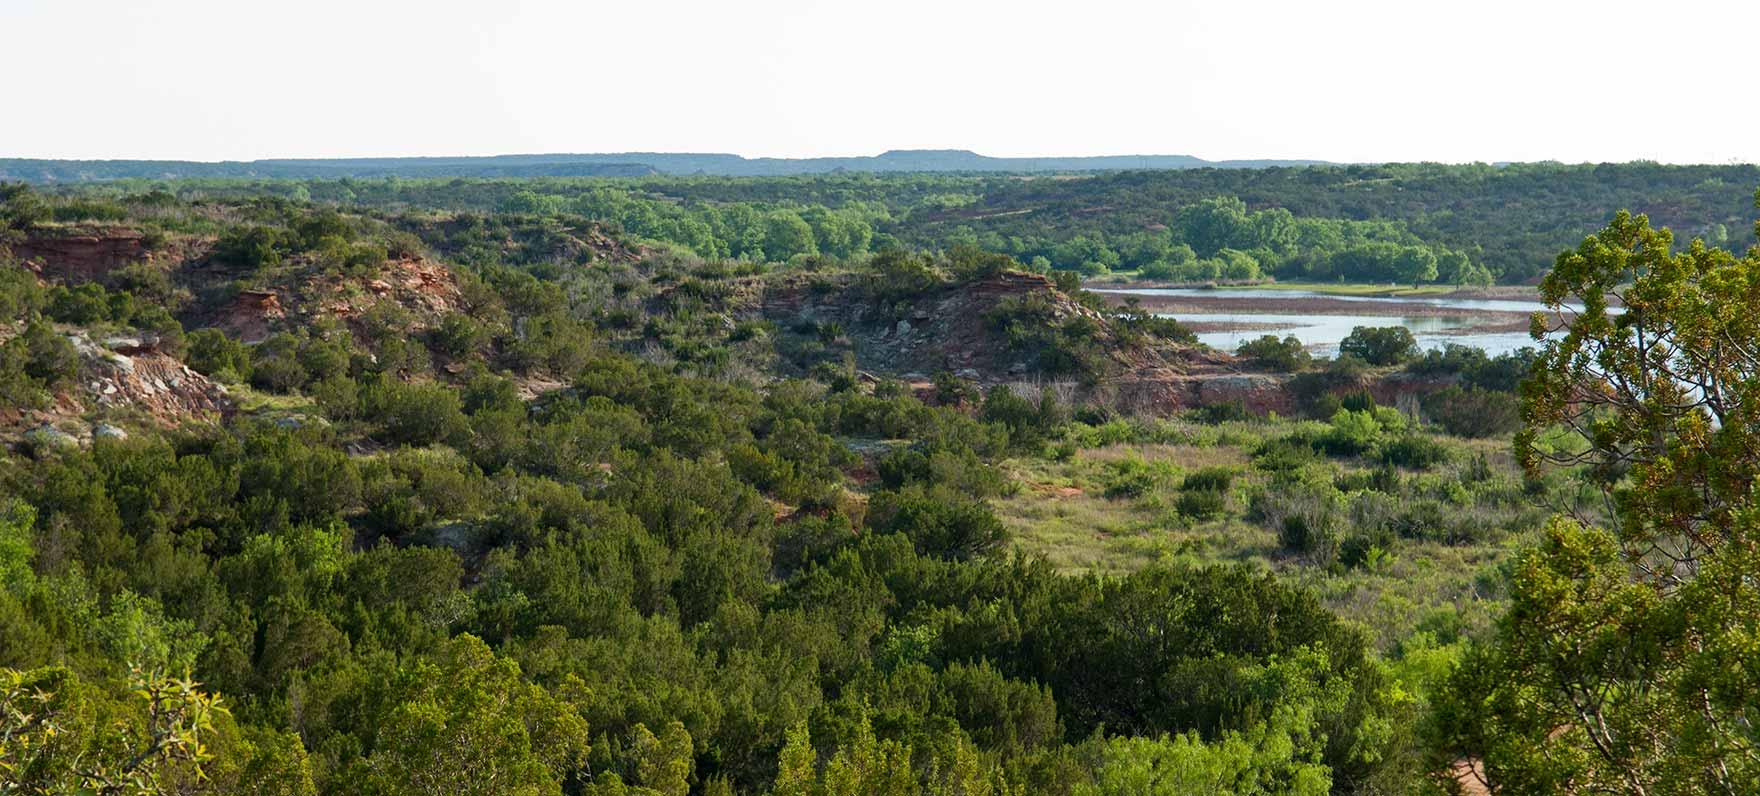 Copper Breaks State Park Texas Parks Amp Wildlife Department